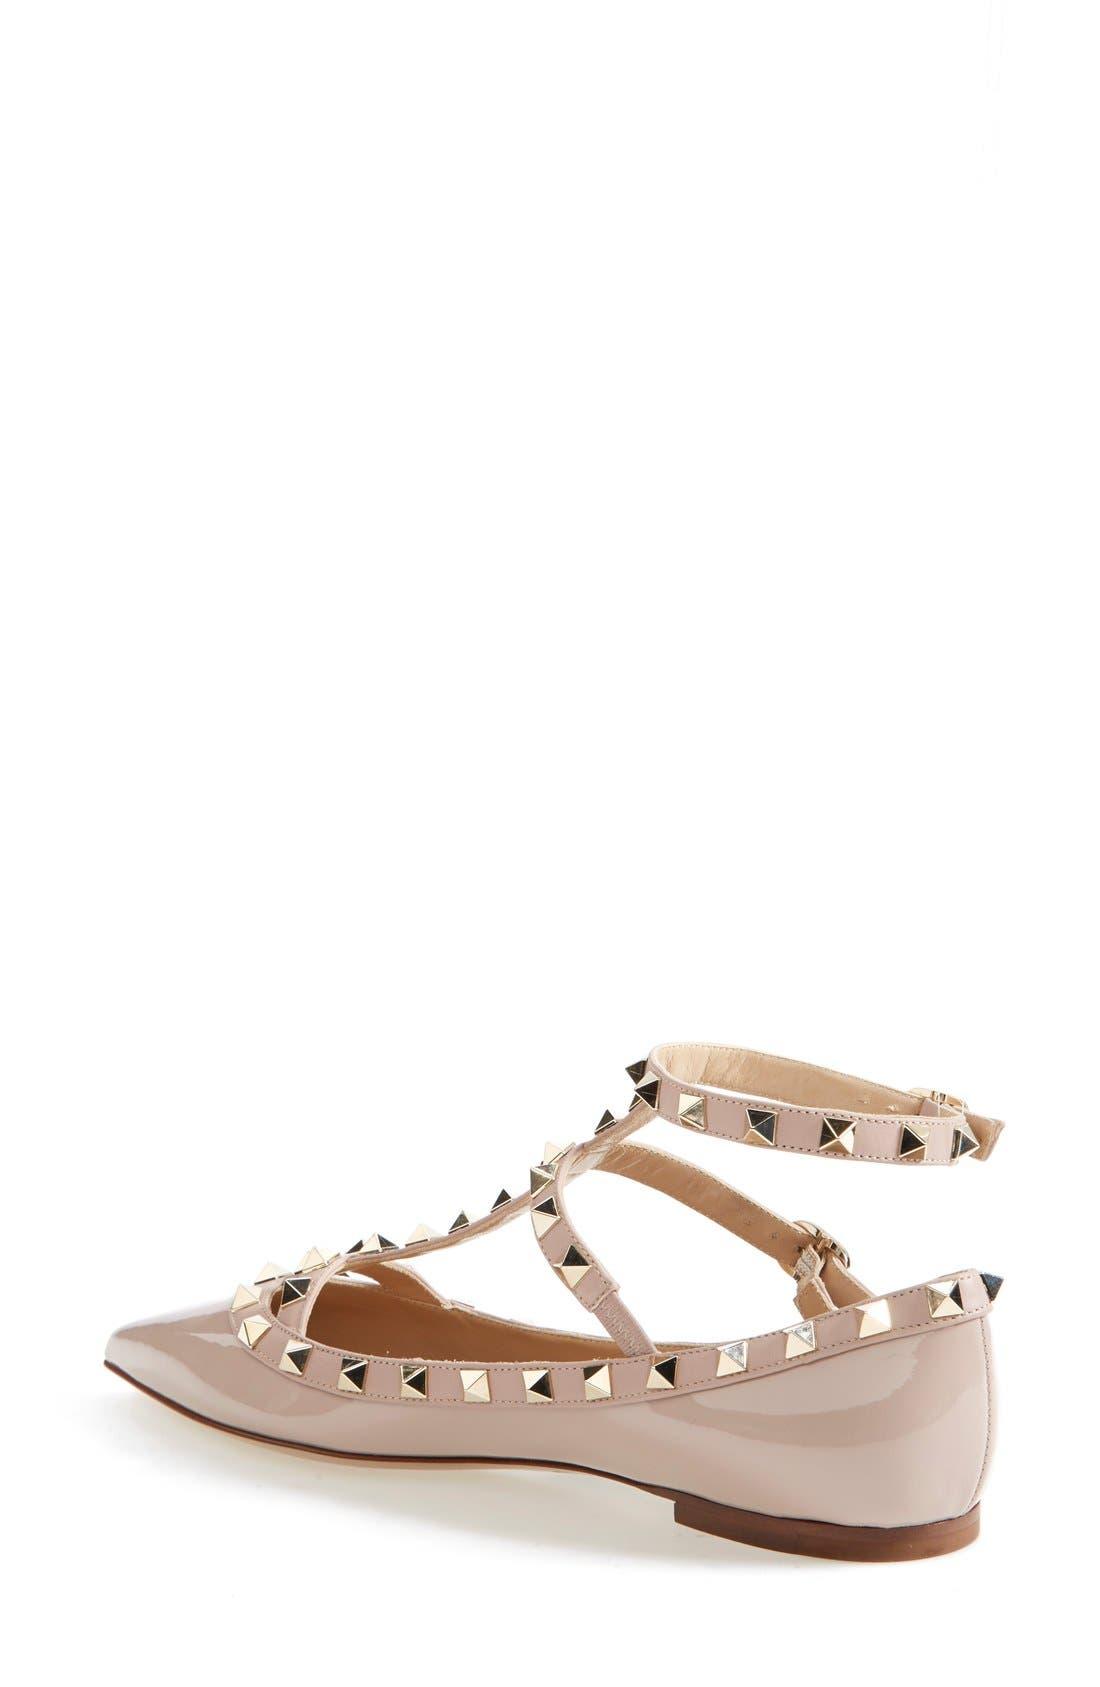 Alternate Image 2  - Valentino 'Rockstud' Patent Leather T-Strap Ballerina Flat (Women)